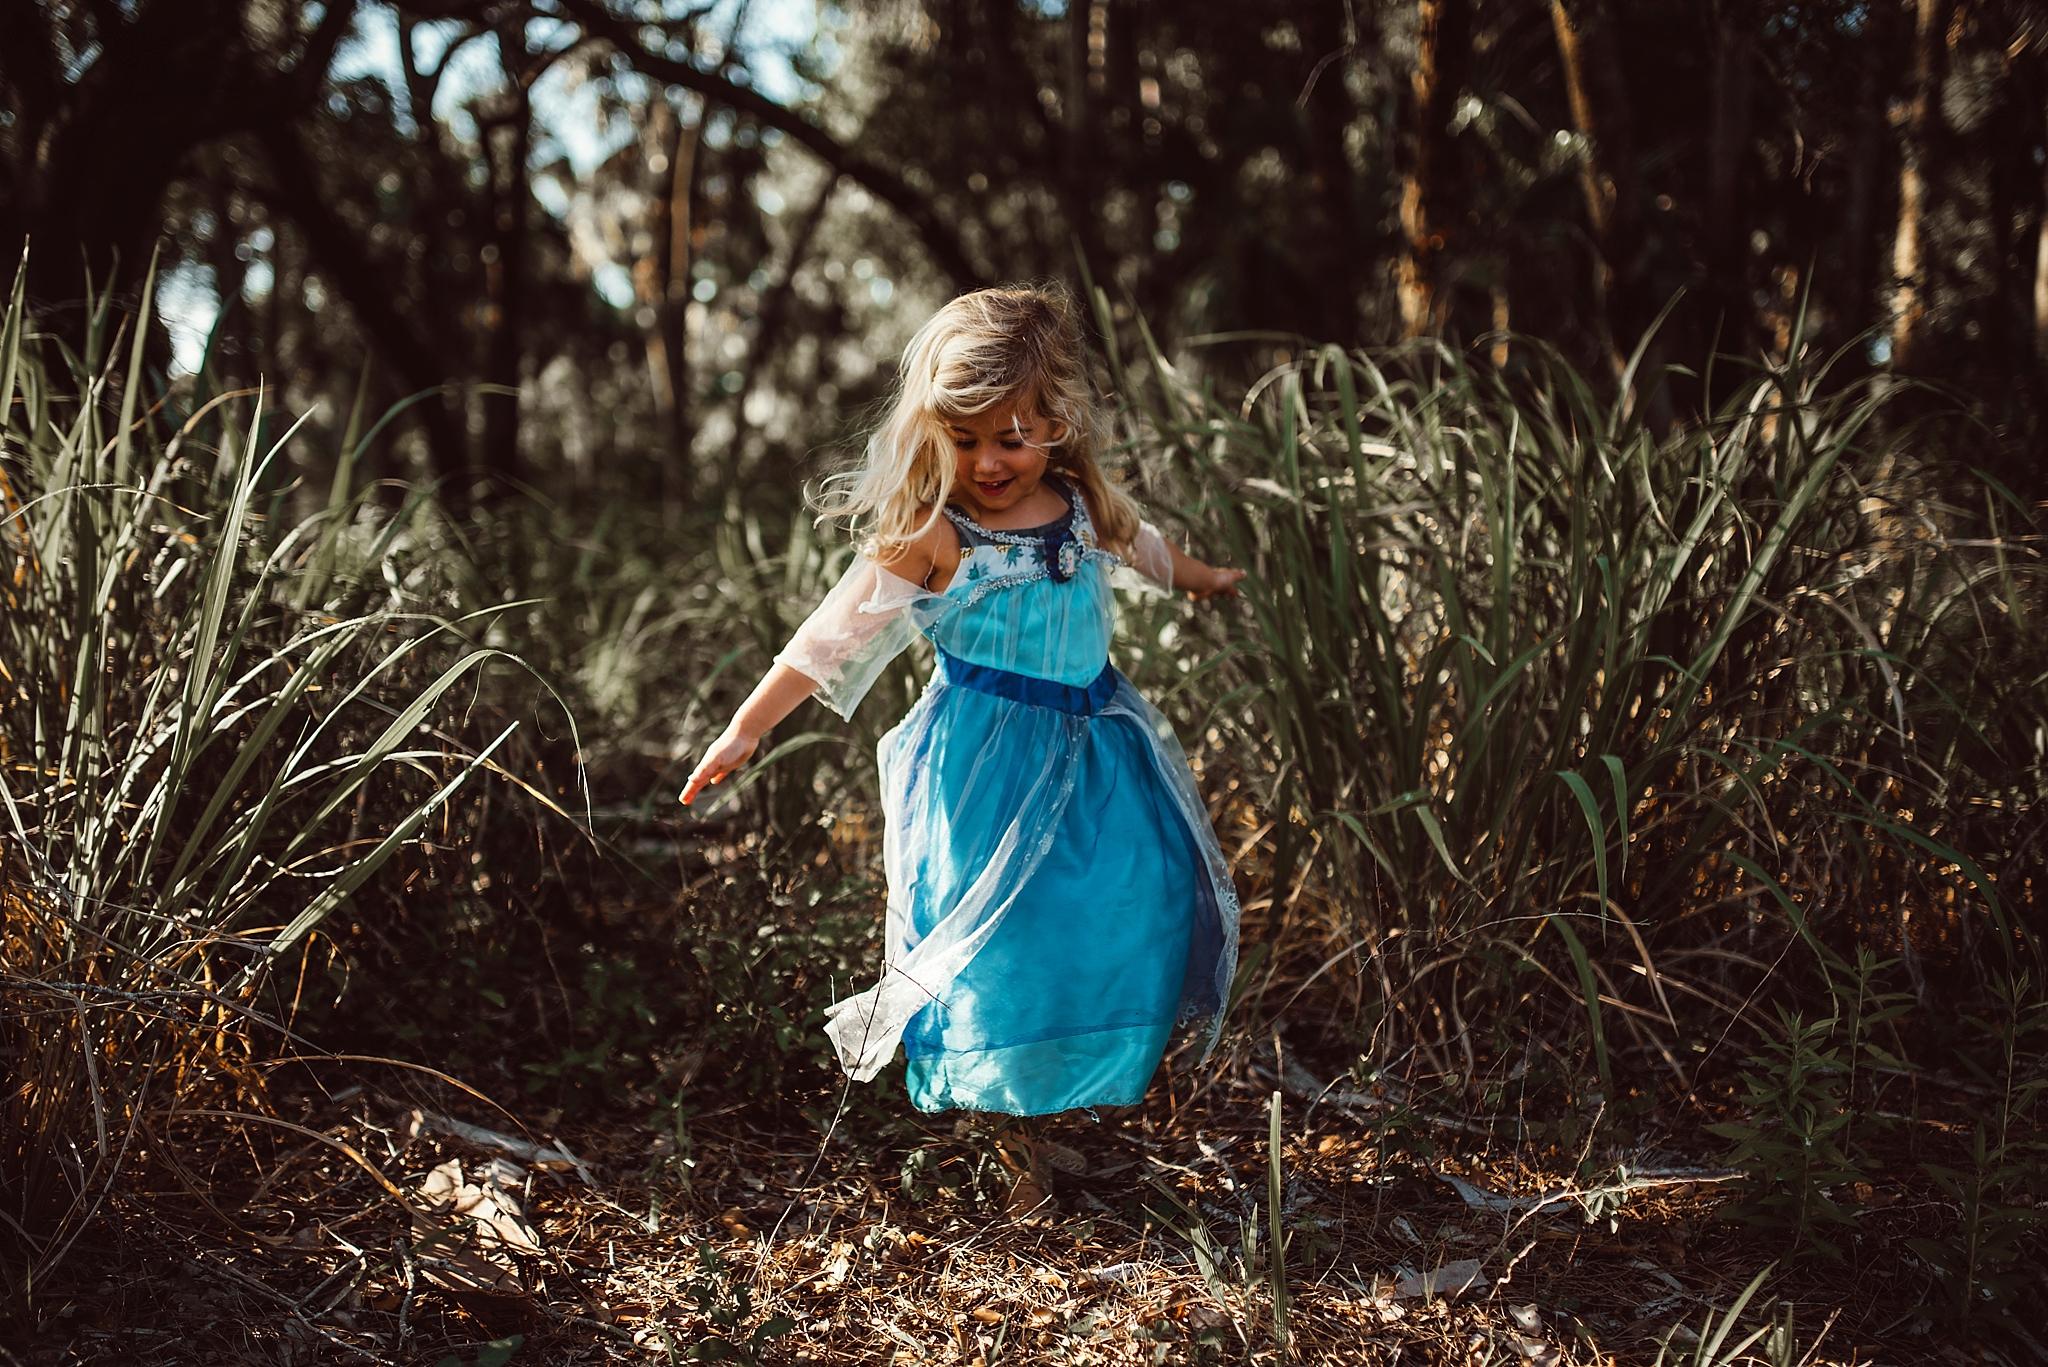 twyla jones photography - treasure coast - florida family photography riverbend park jupiter florida-5581.jpg